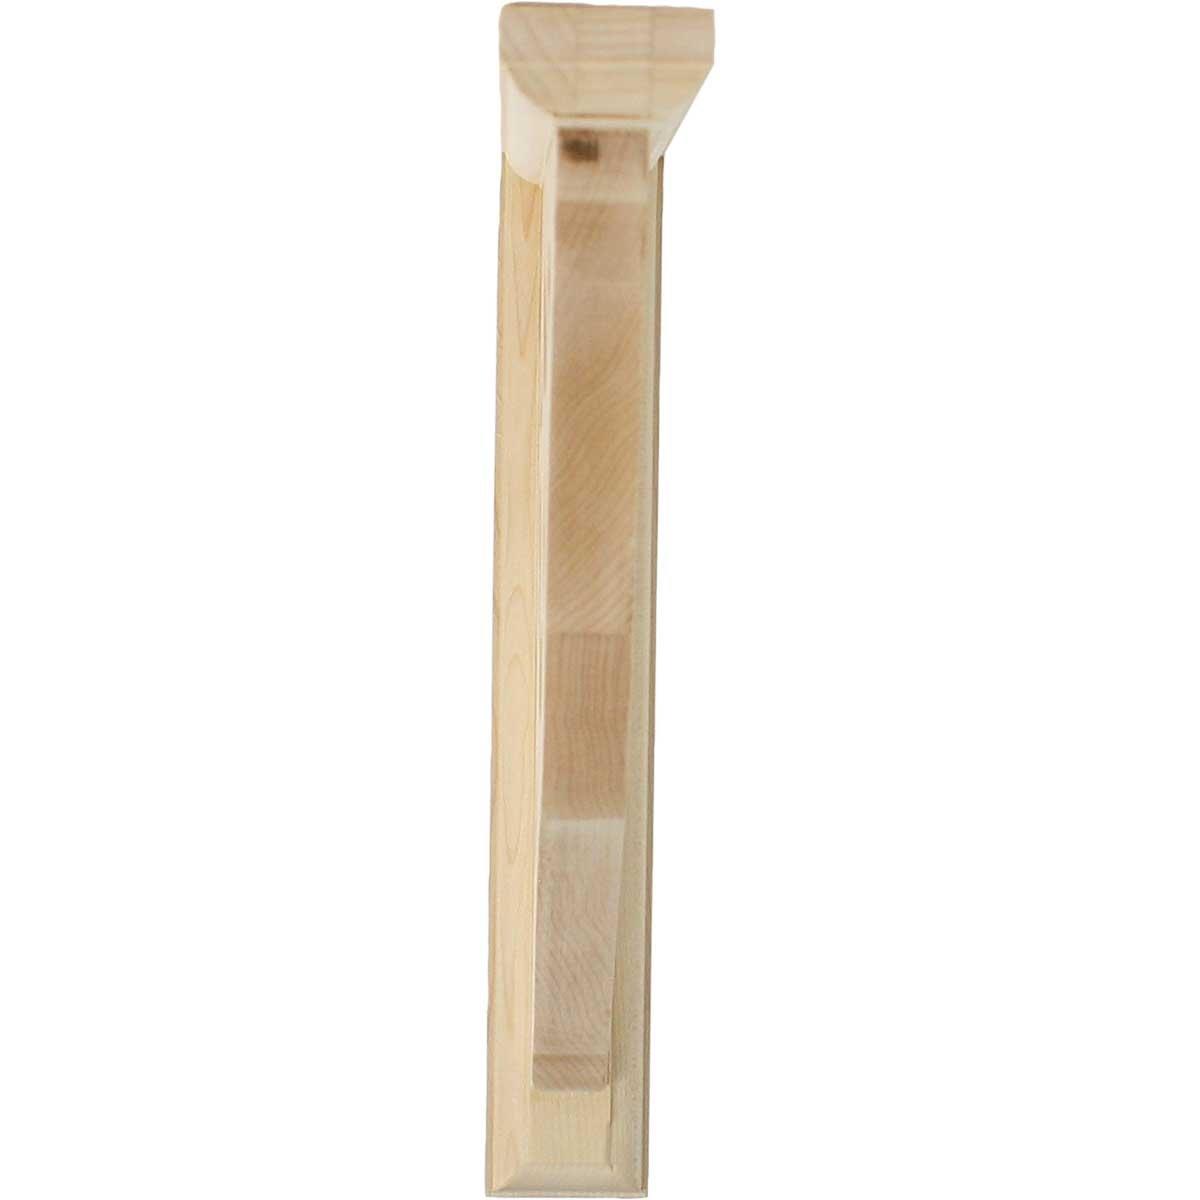 Ekena Millwork BKT01X10X10AURO-CASE-6 1 2 inch W x 10 inch D x 10 inch H Austin Bracket 6-Pack Red Oak ,